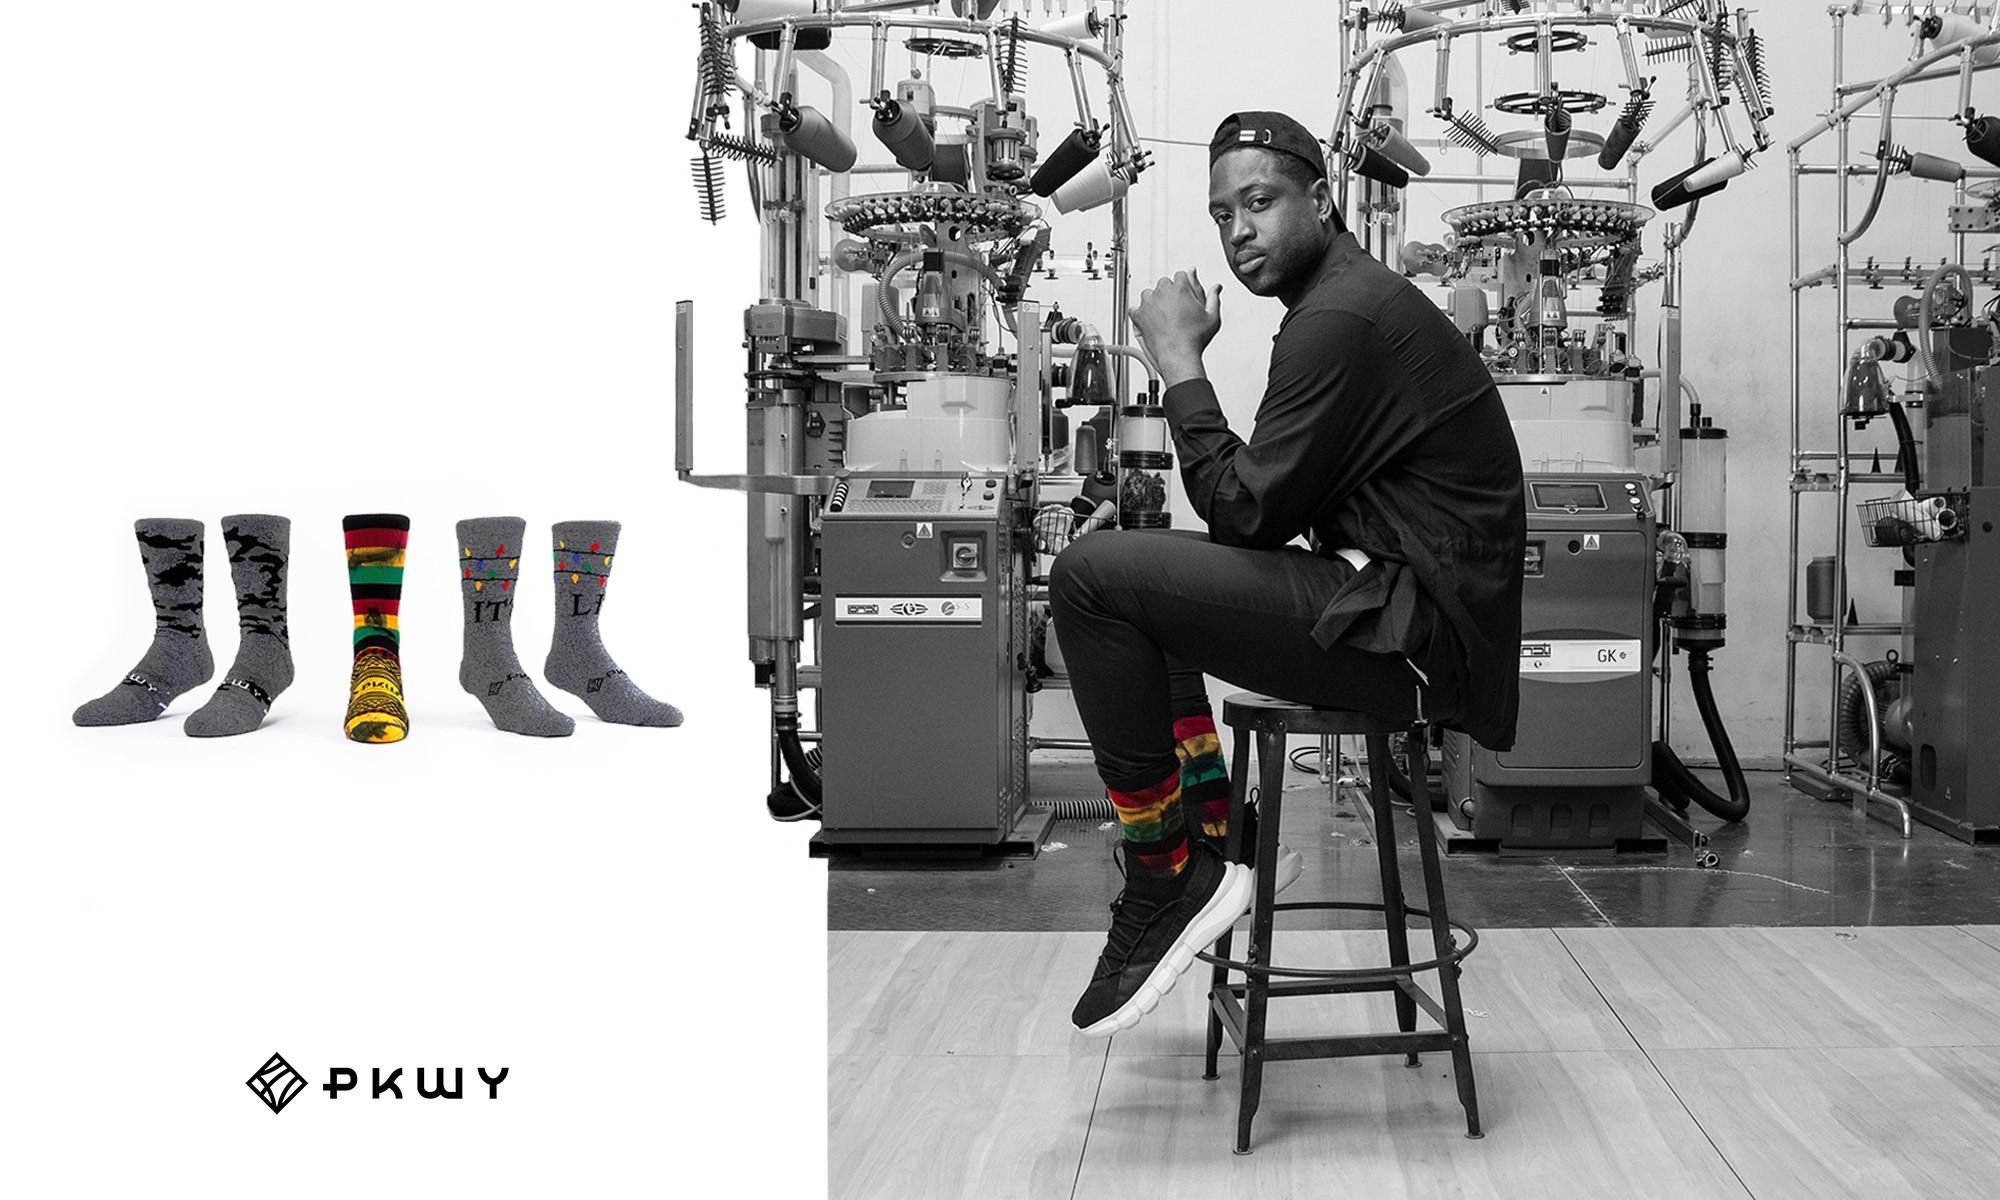 Dwyane Wade First Pkwy Lifestyle Sock